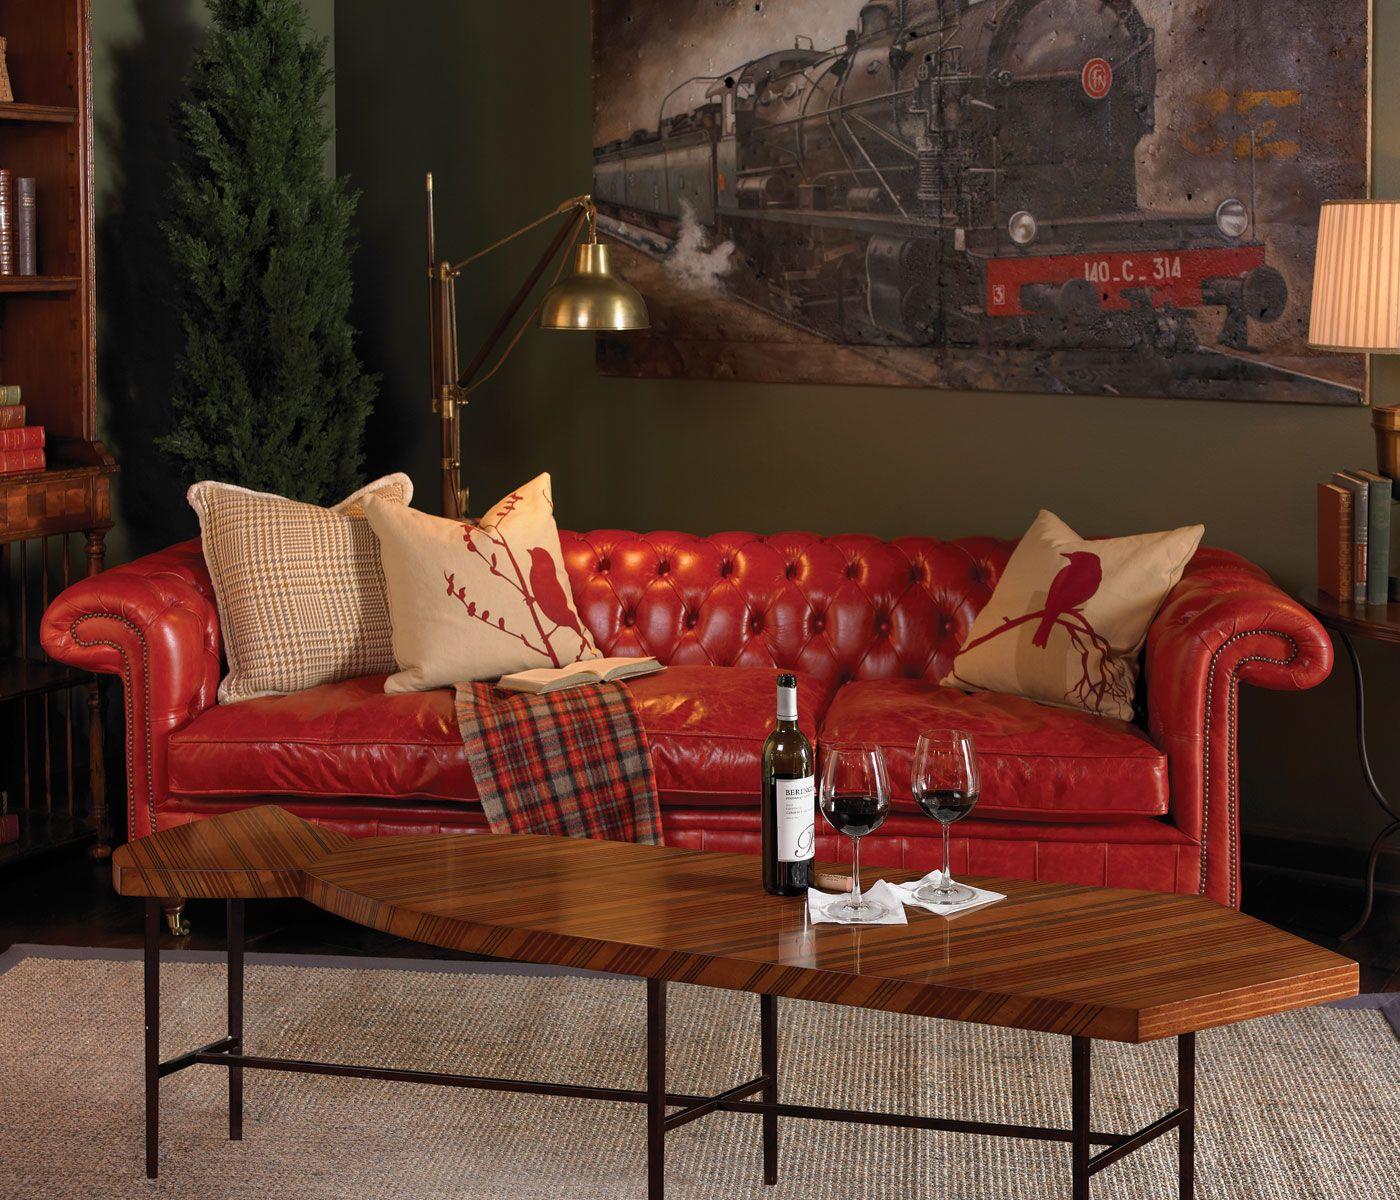 Cozy Modern Homedecor:  Alexander Julian #jonathancharles